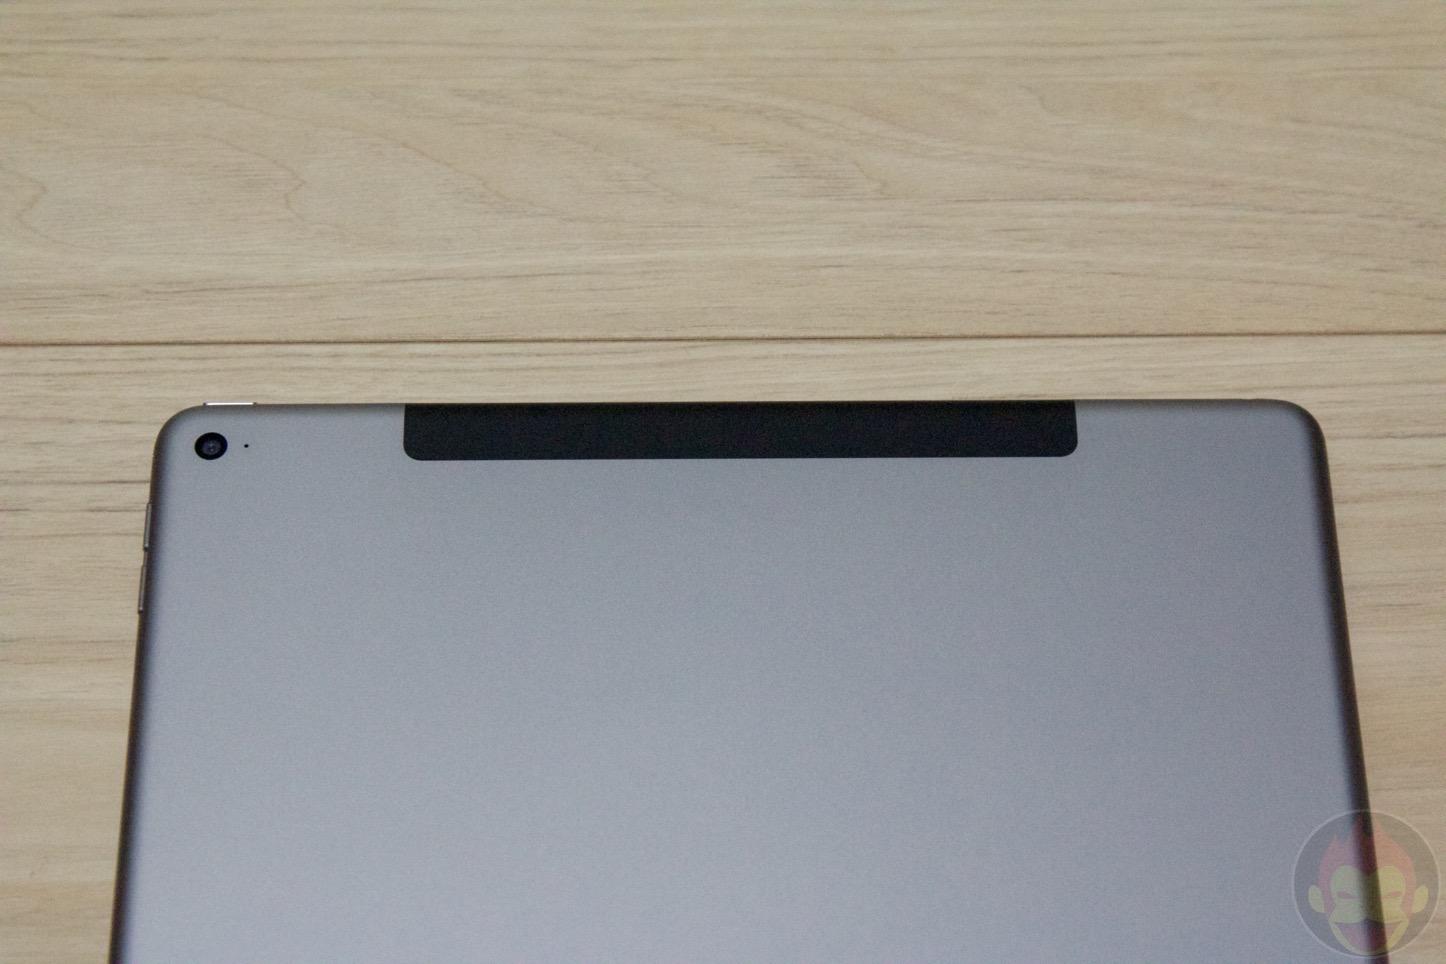 iPad-Pro-Unboxing-16.jpg